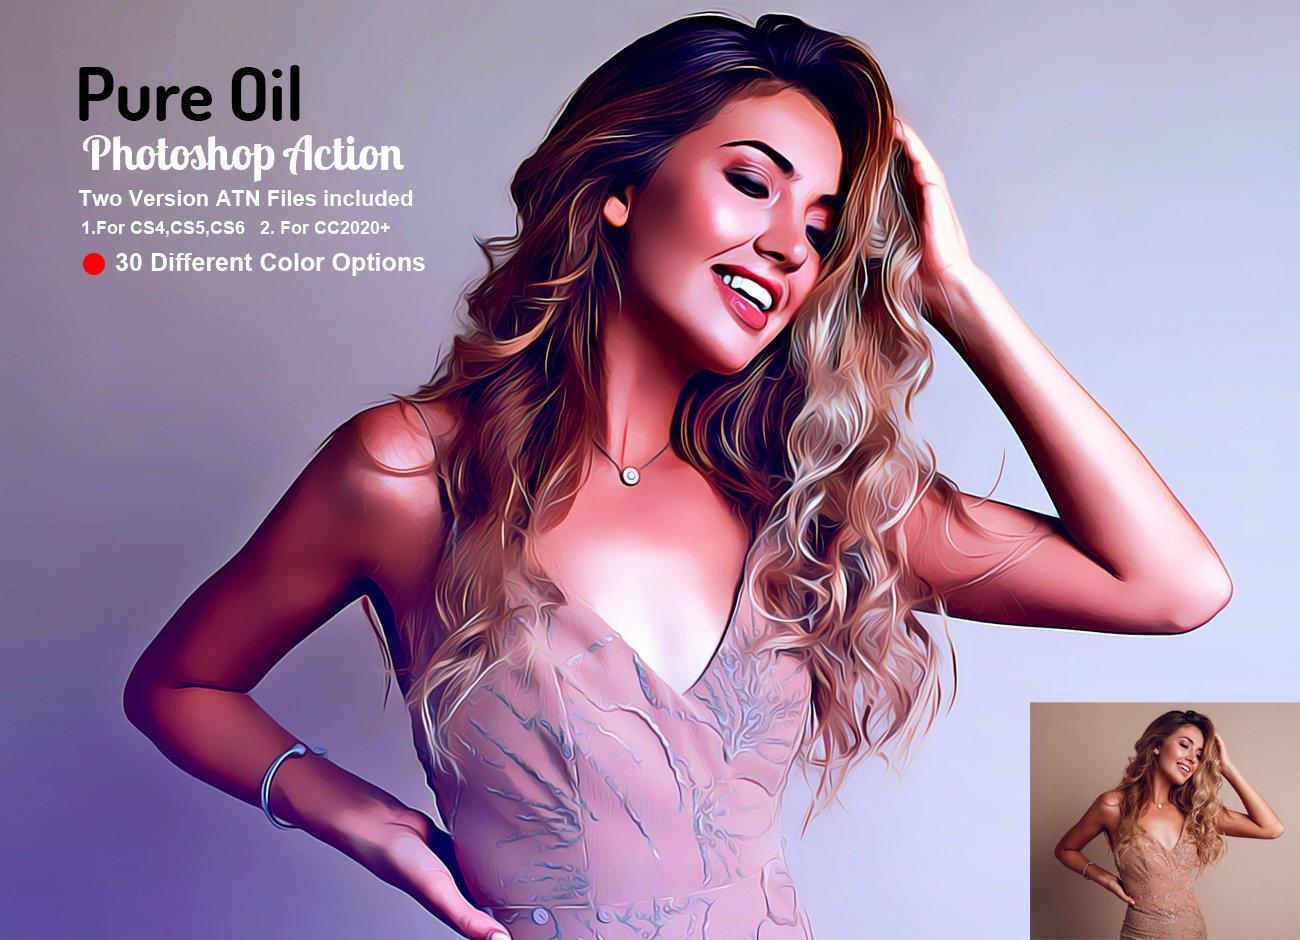 اکشن فتوشاپ Pure Oil